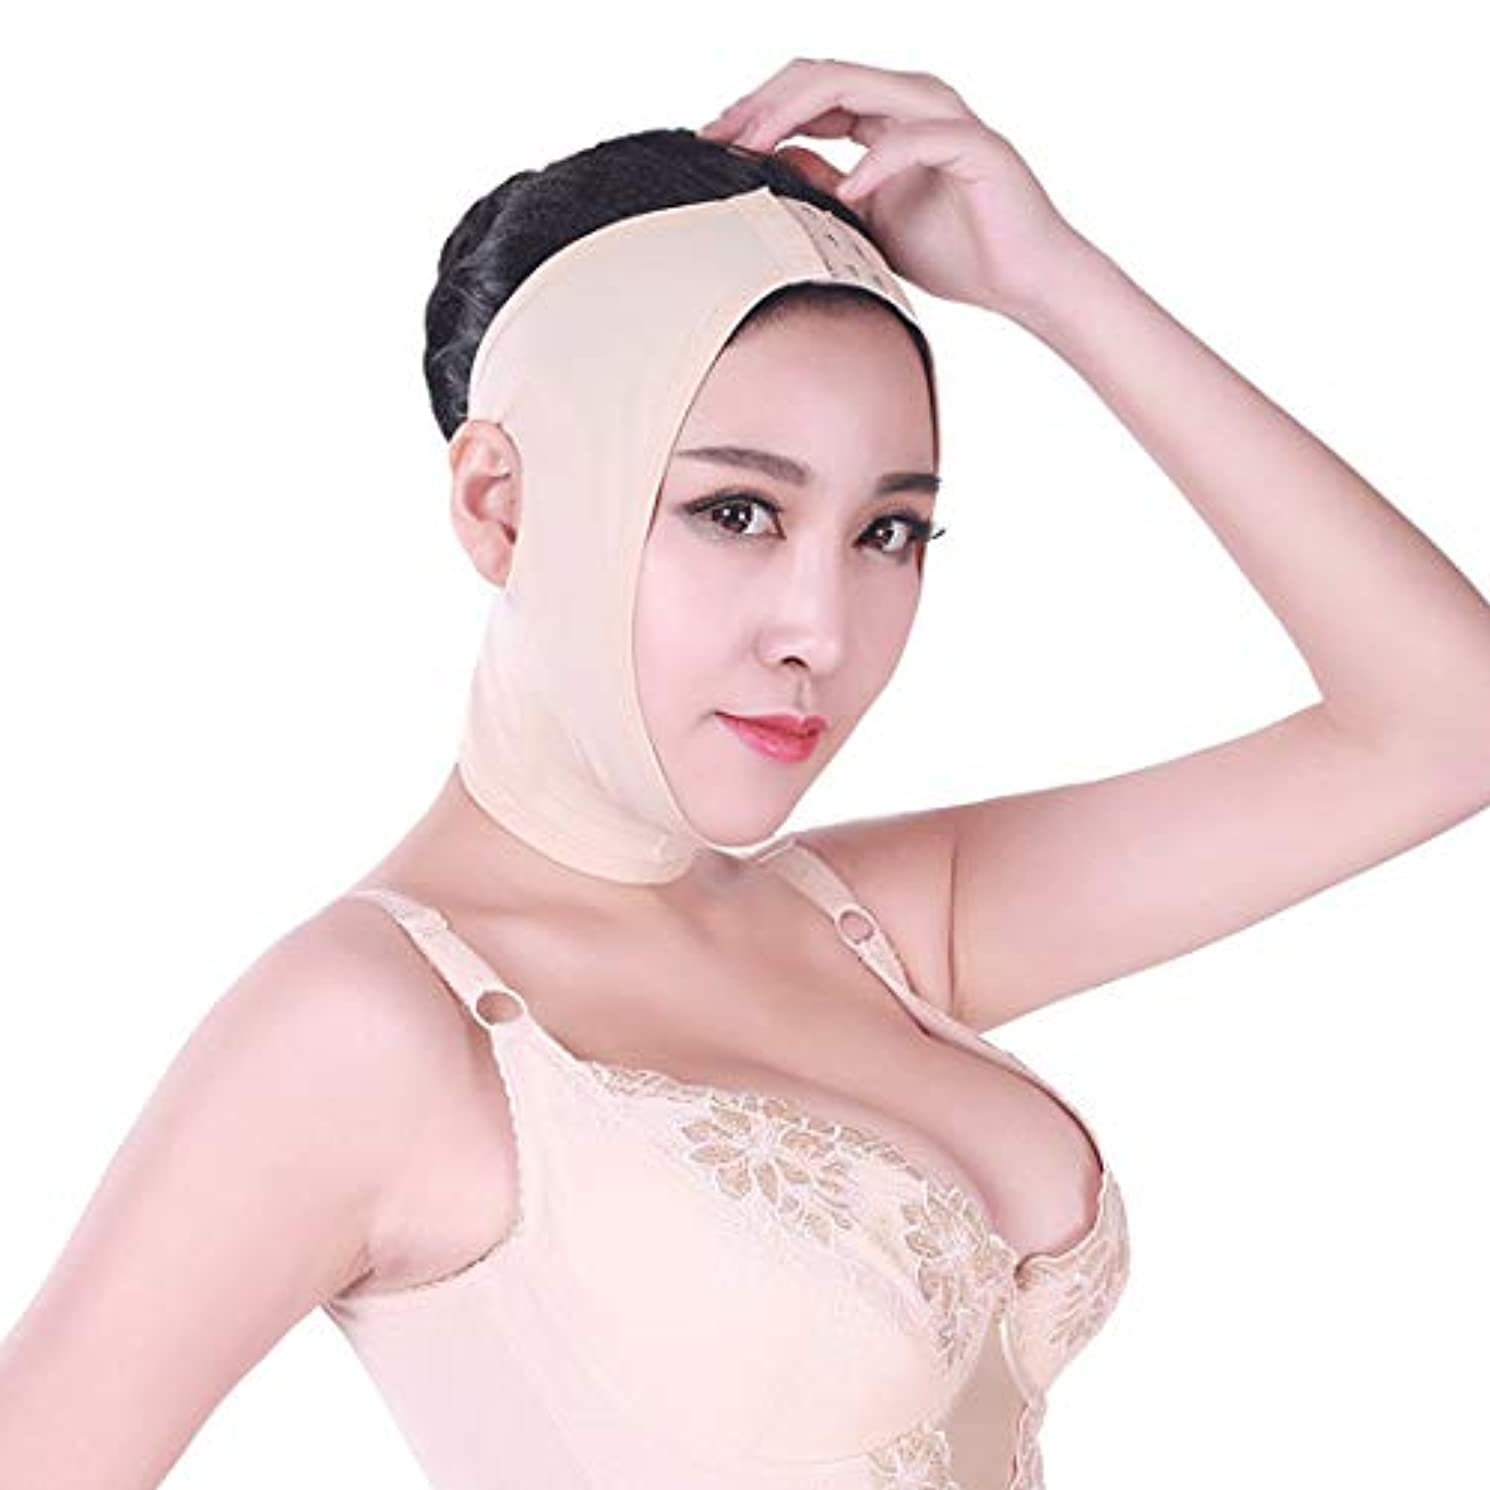 ZWBD フェイスマスク, 顔の痩身マスク、肌を引き締めるためにVフェイスライン包帯フェイシャルダブルチンリフティングフェイスを持ち上げる (Size : XS)